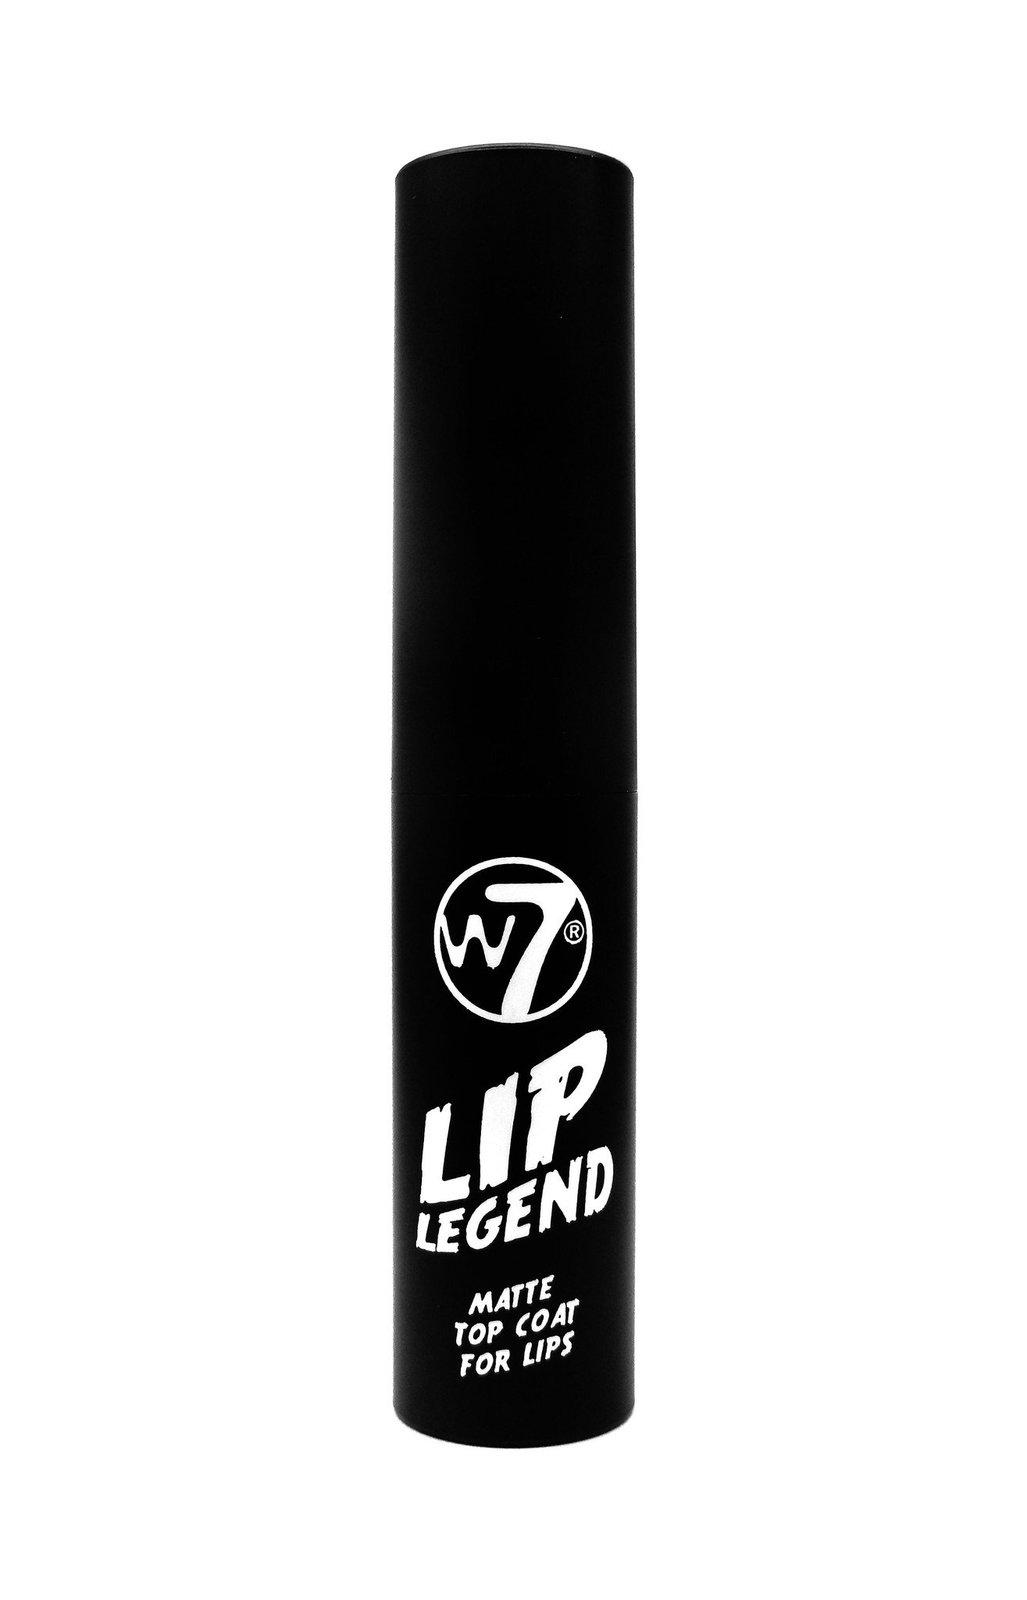 W7 Lip Legend image